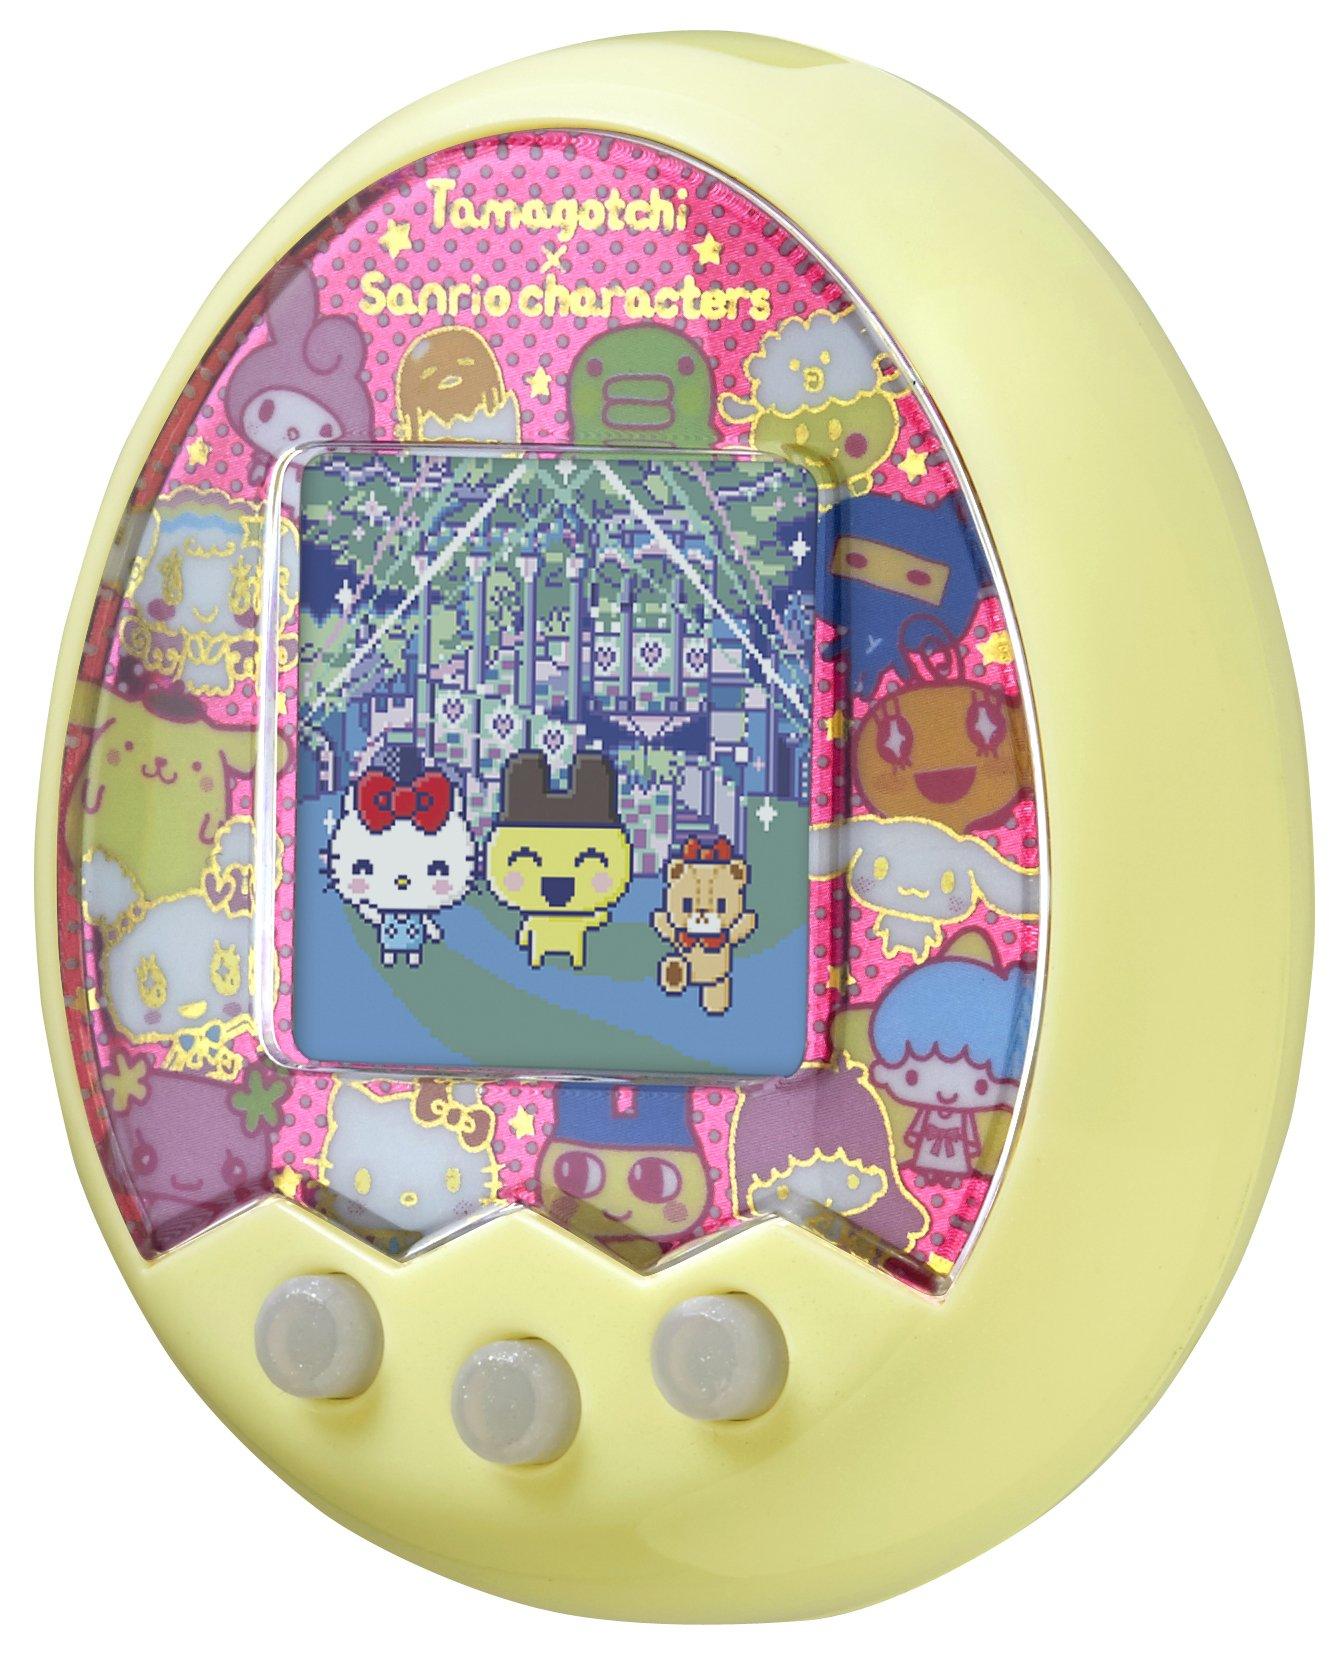 Sanrio Tamagotchi m!x Sanrio Characters m!x ver.